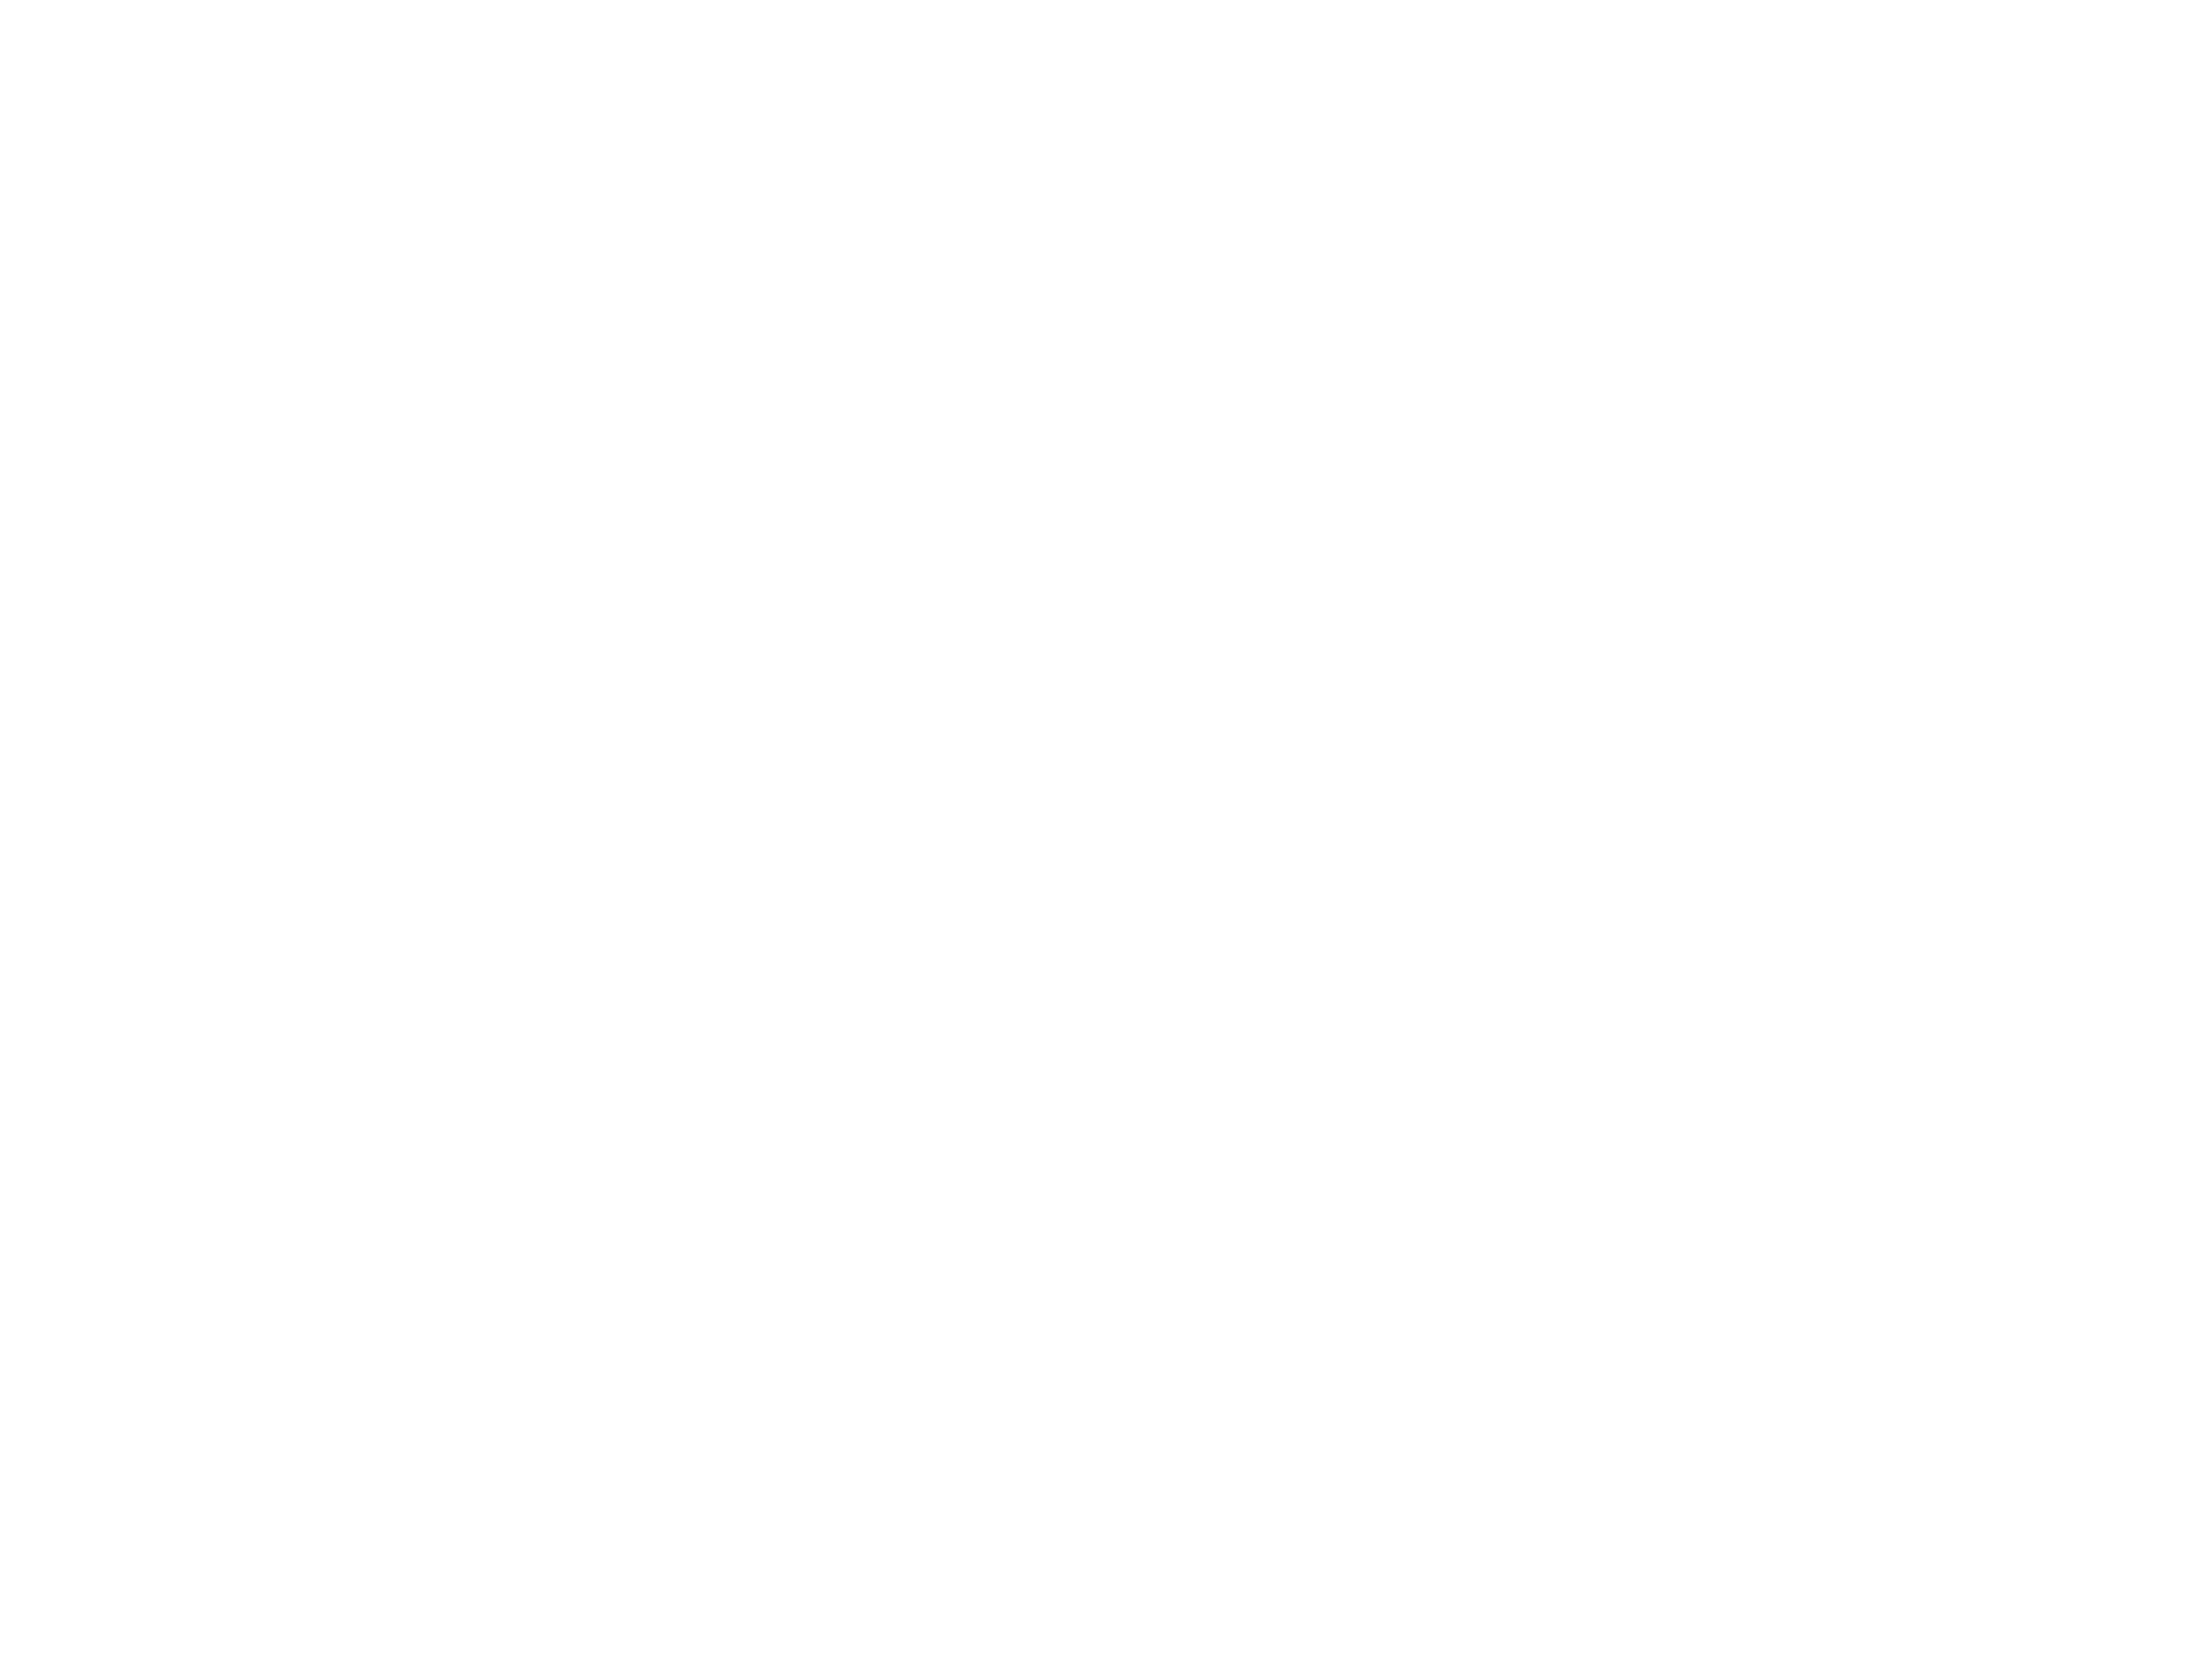 Actionedit